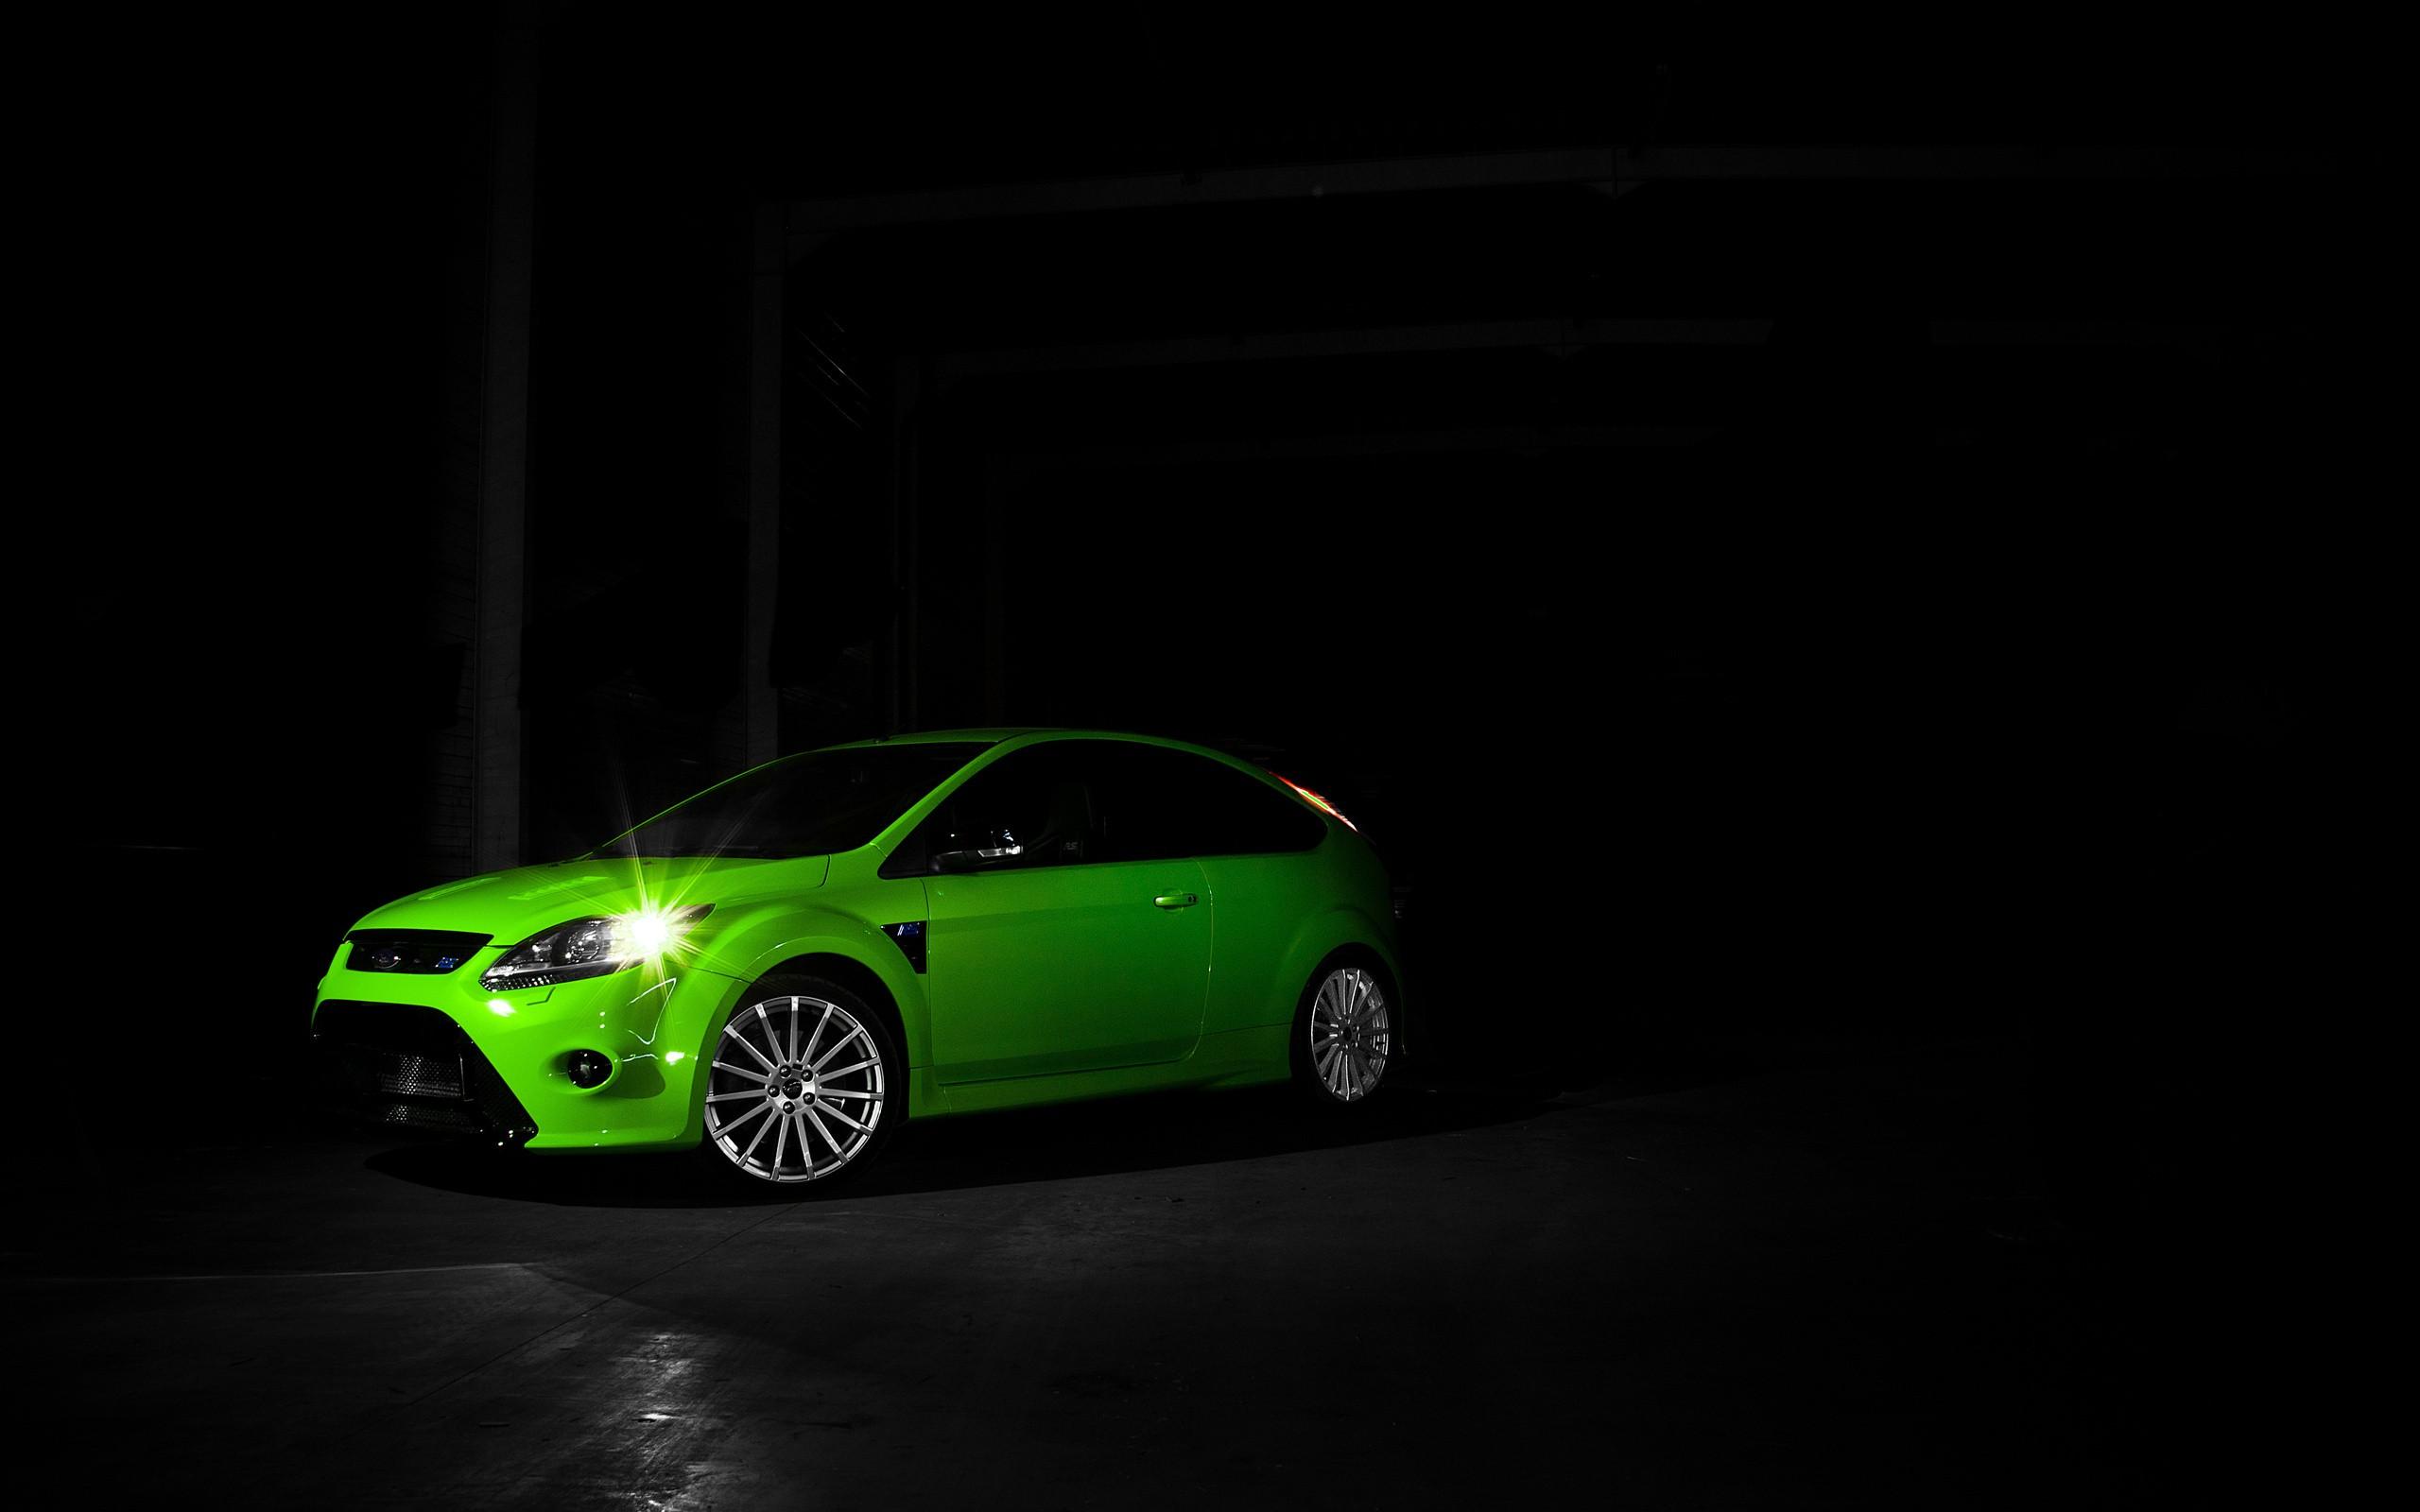 free green car wallpaper 32623